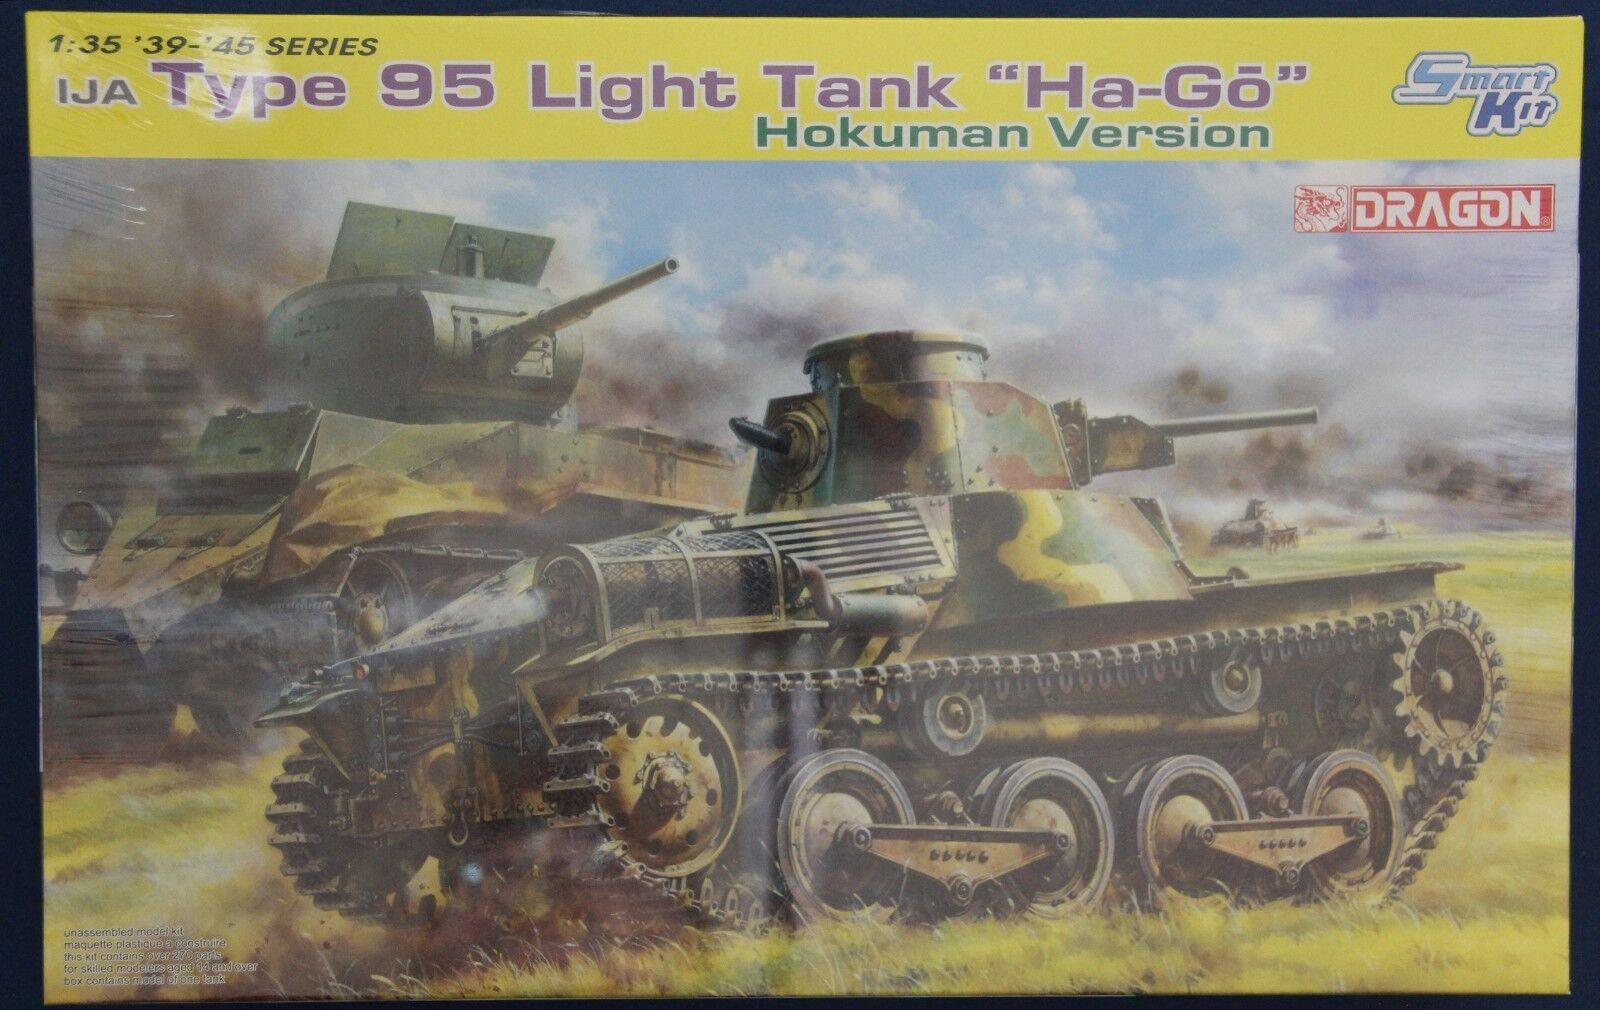 Dragon 6777 1 35 Type 95 Light Tank Ha-Go Hokuman Version